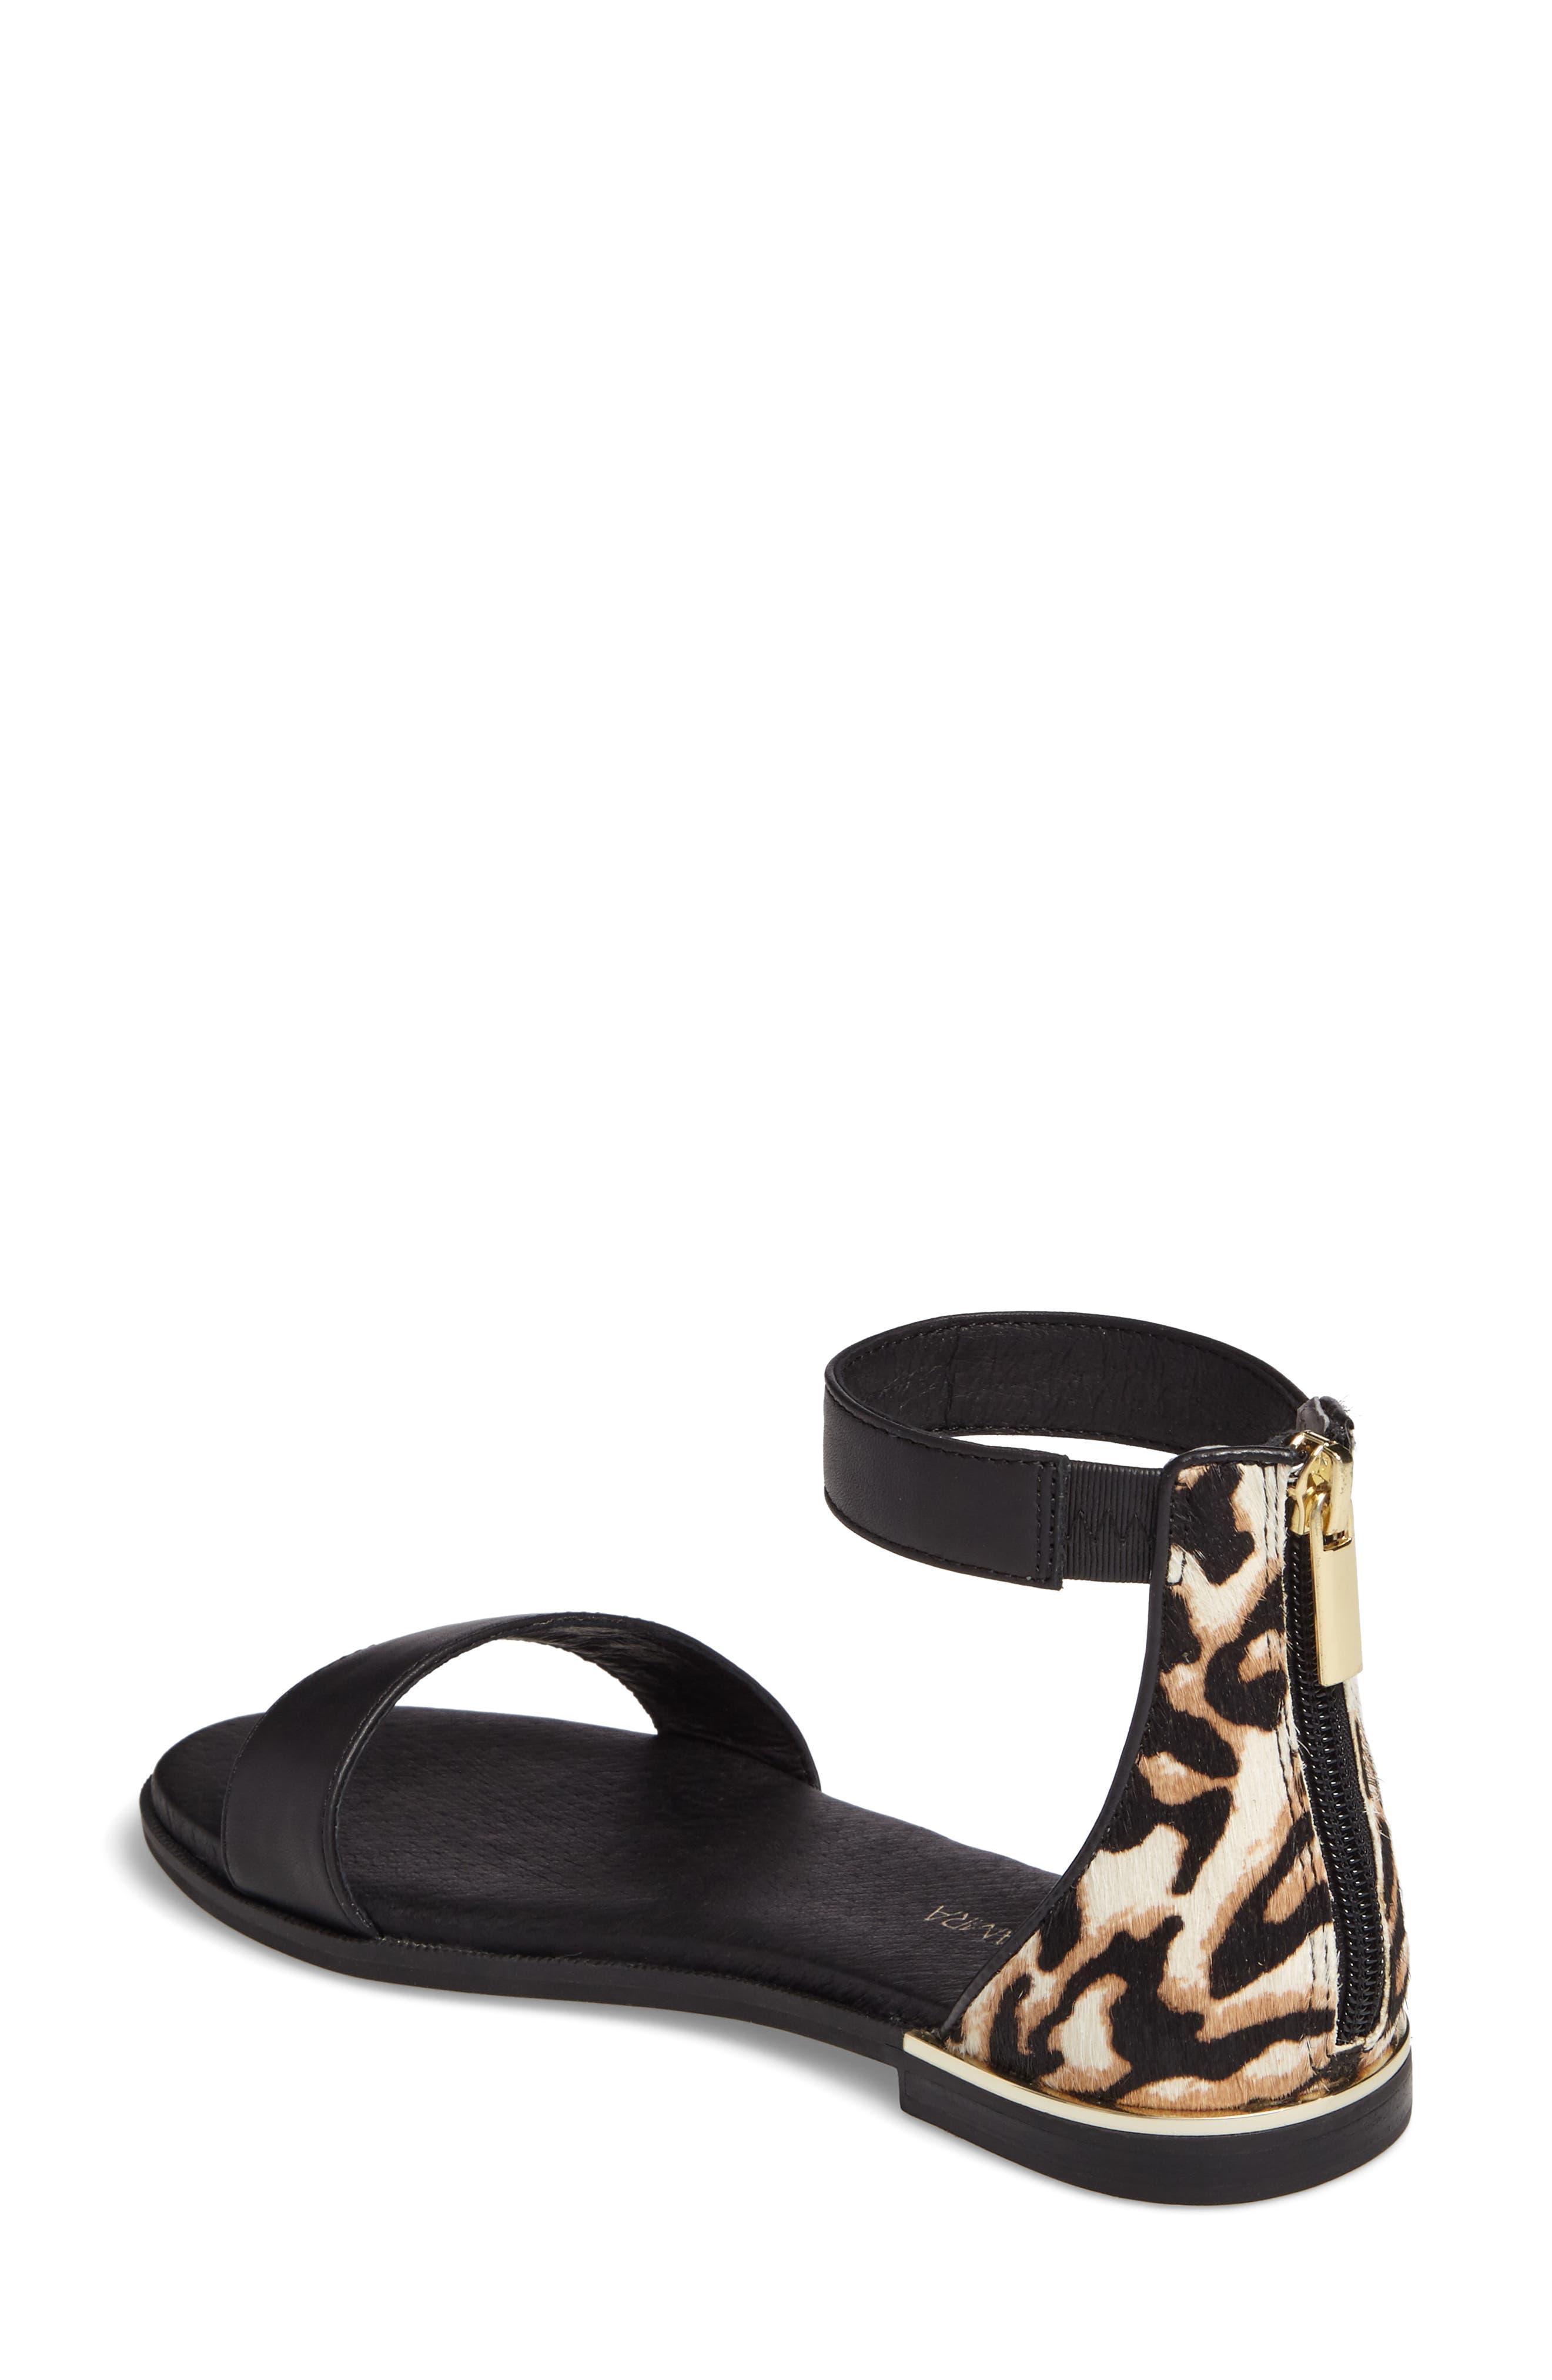 ,                             'Cambelle' Ankle Strap Sandal,                             Alternate thumbnail 24, color,                             118